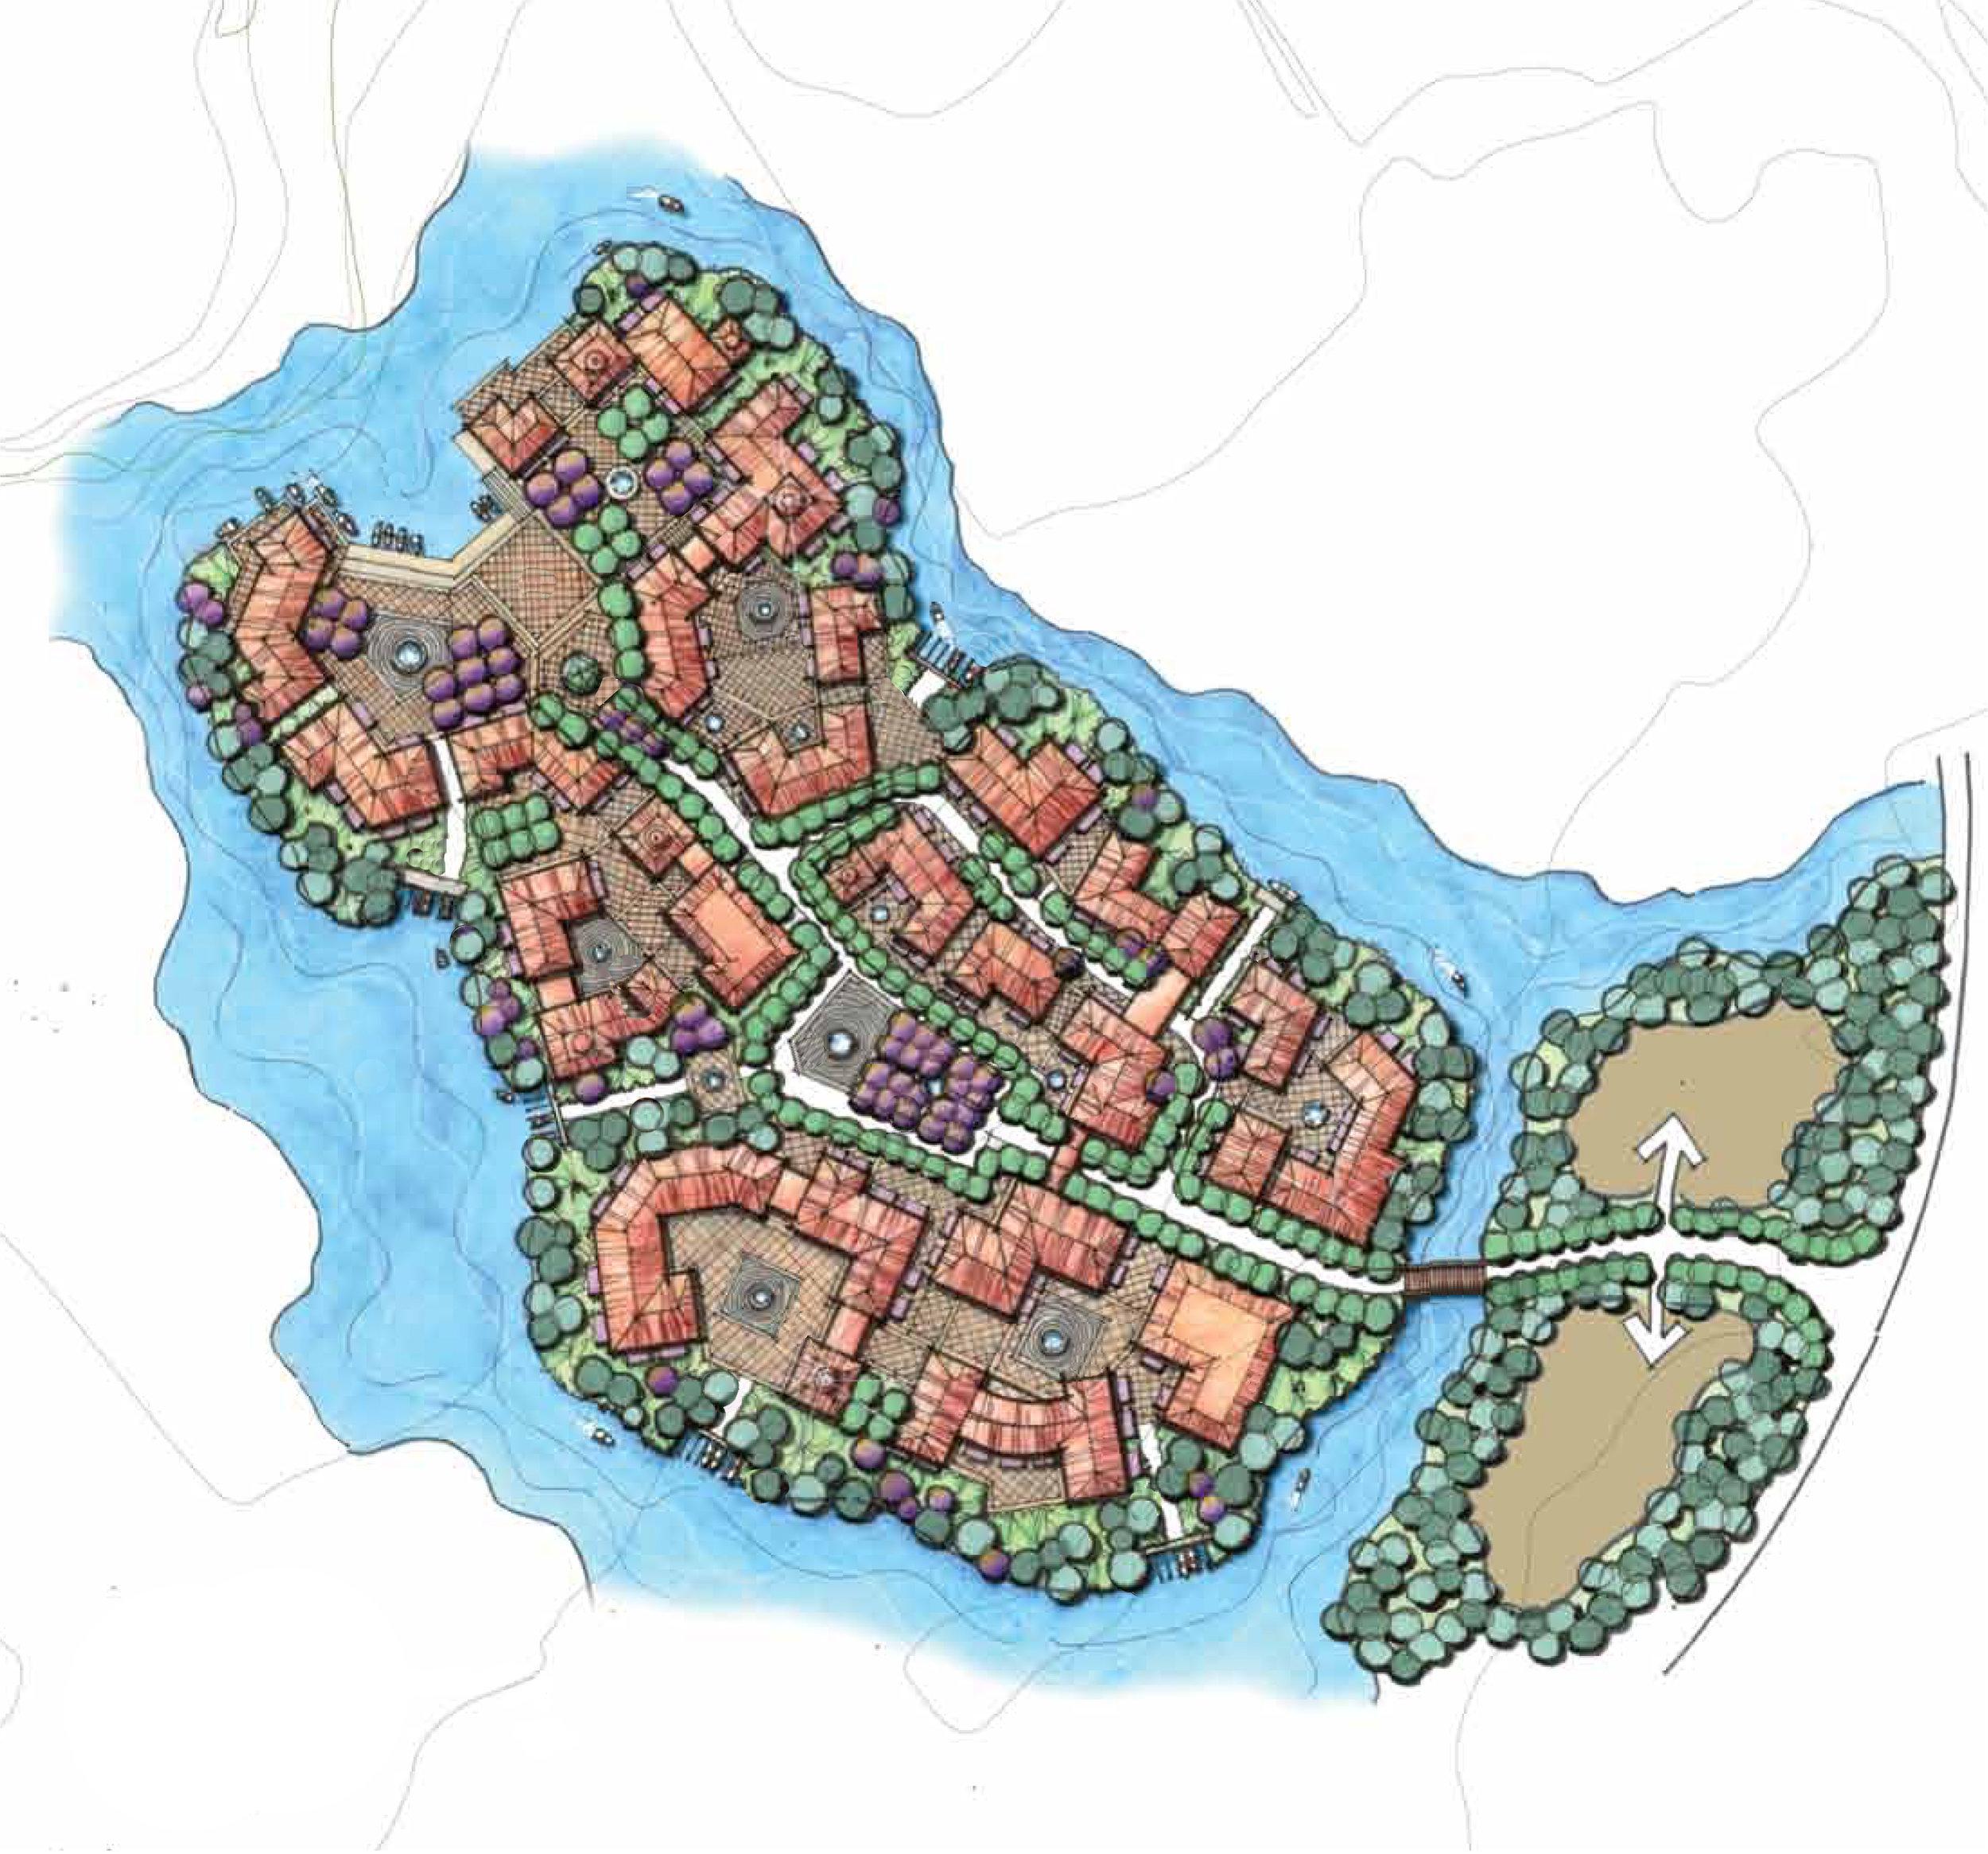 fishing village concept